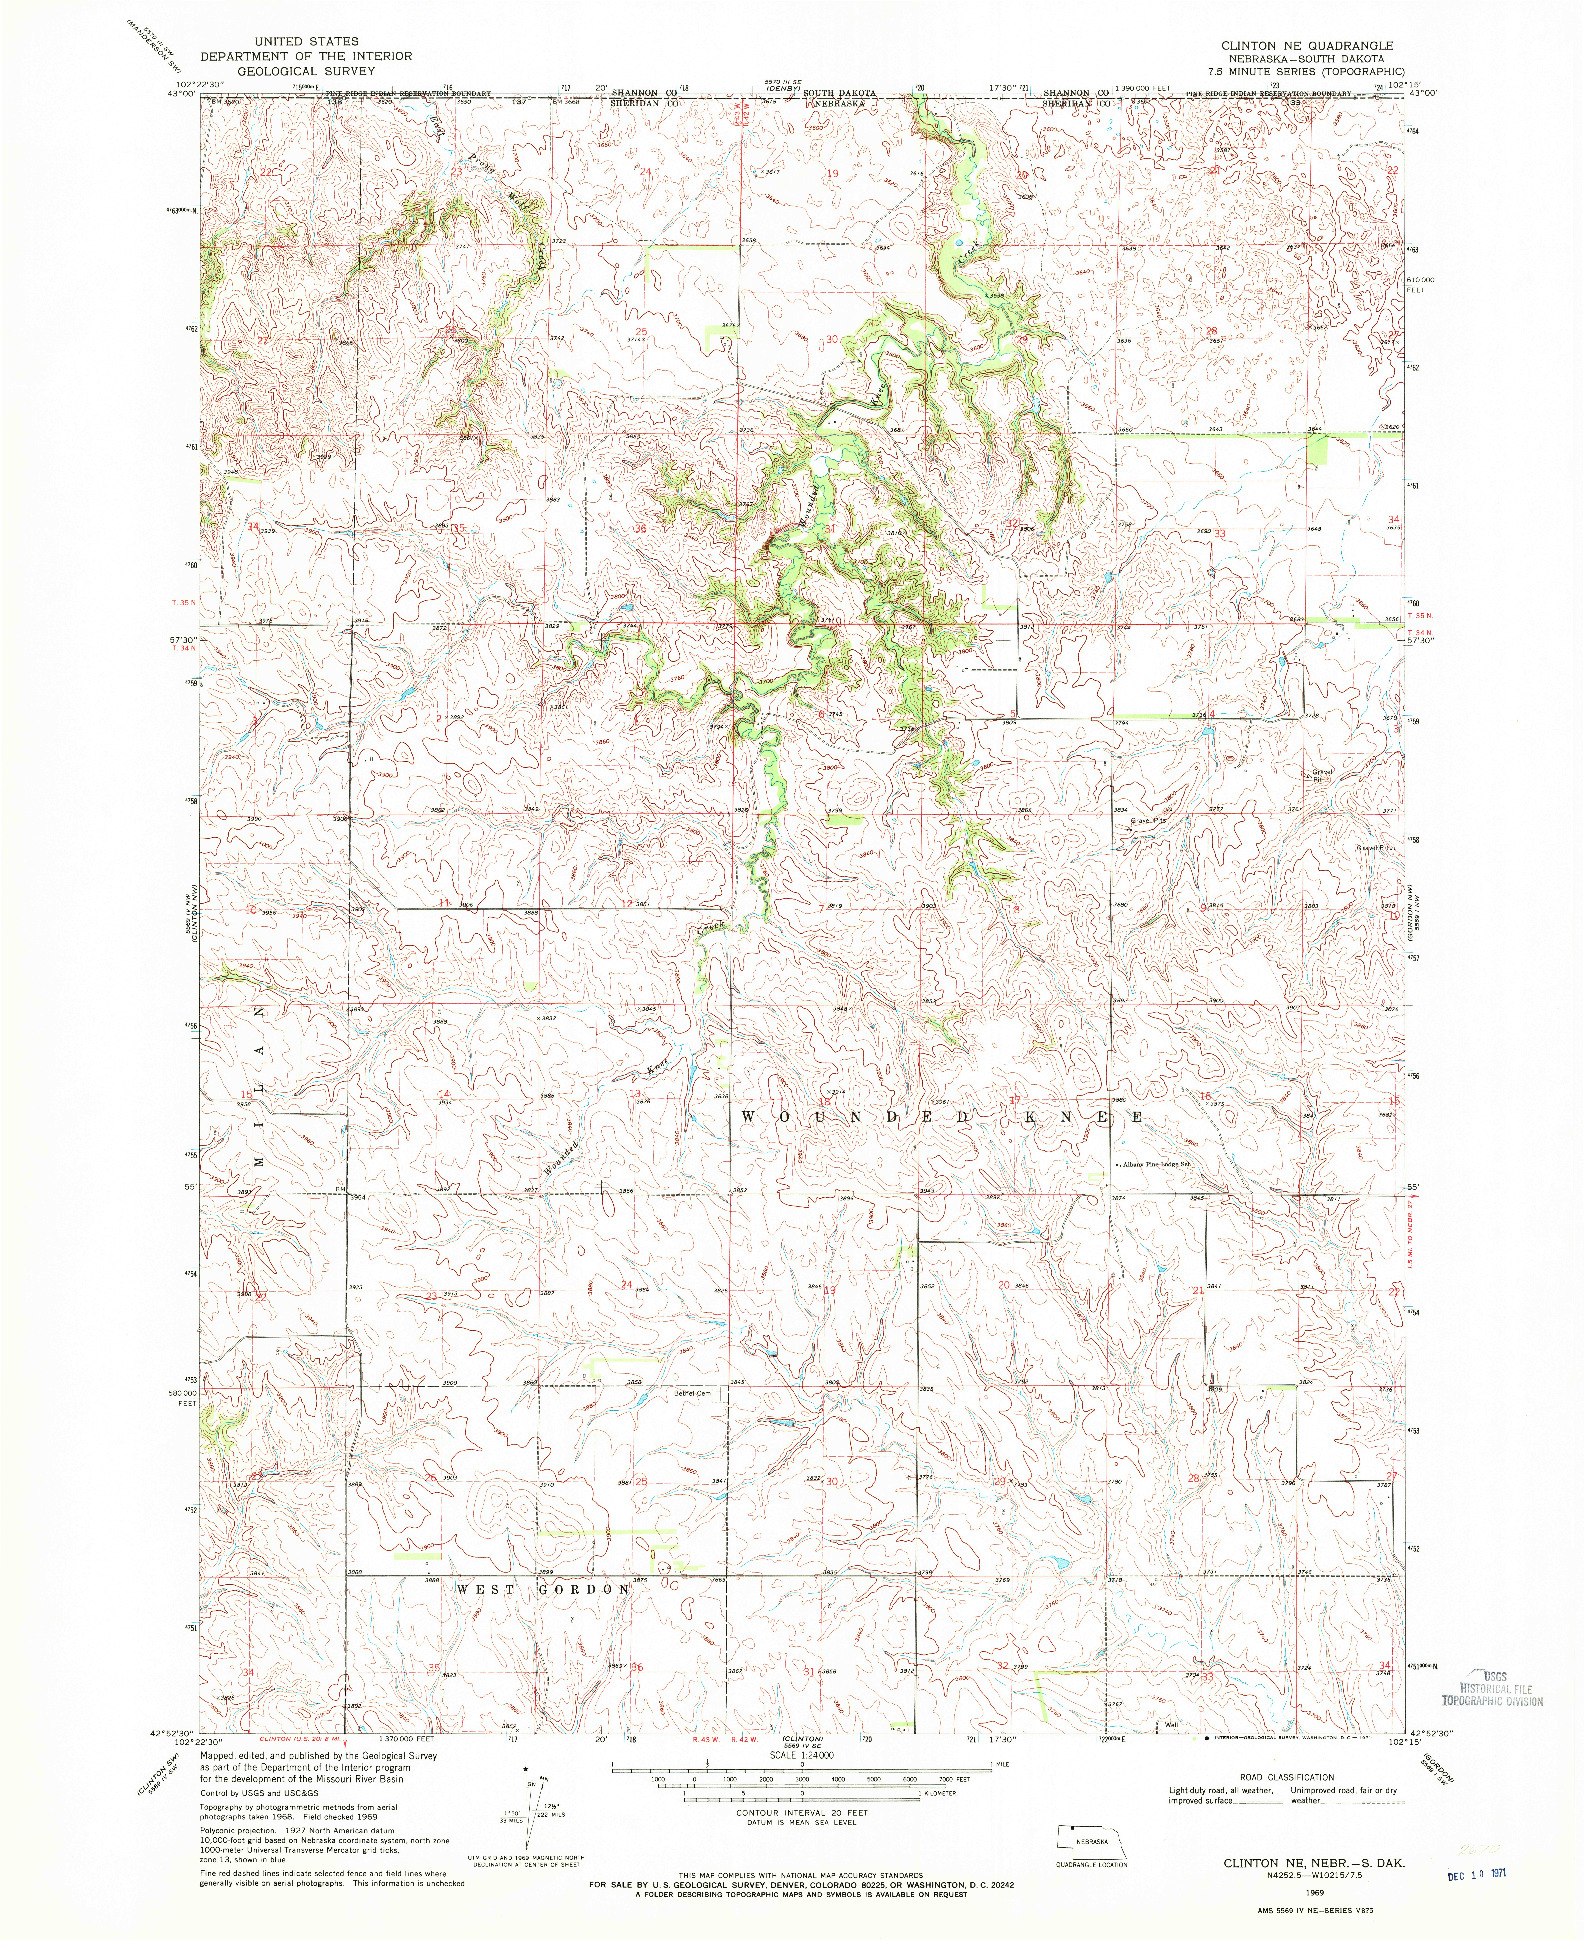 USGS 1:24000-SCALE QUADRANGLE FOR CLINTON NE, NE 1969